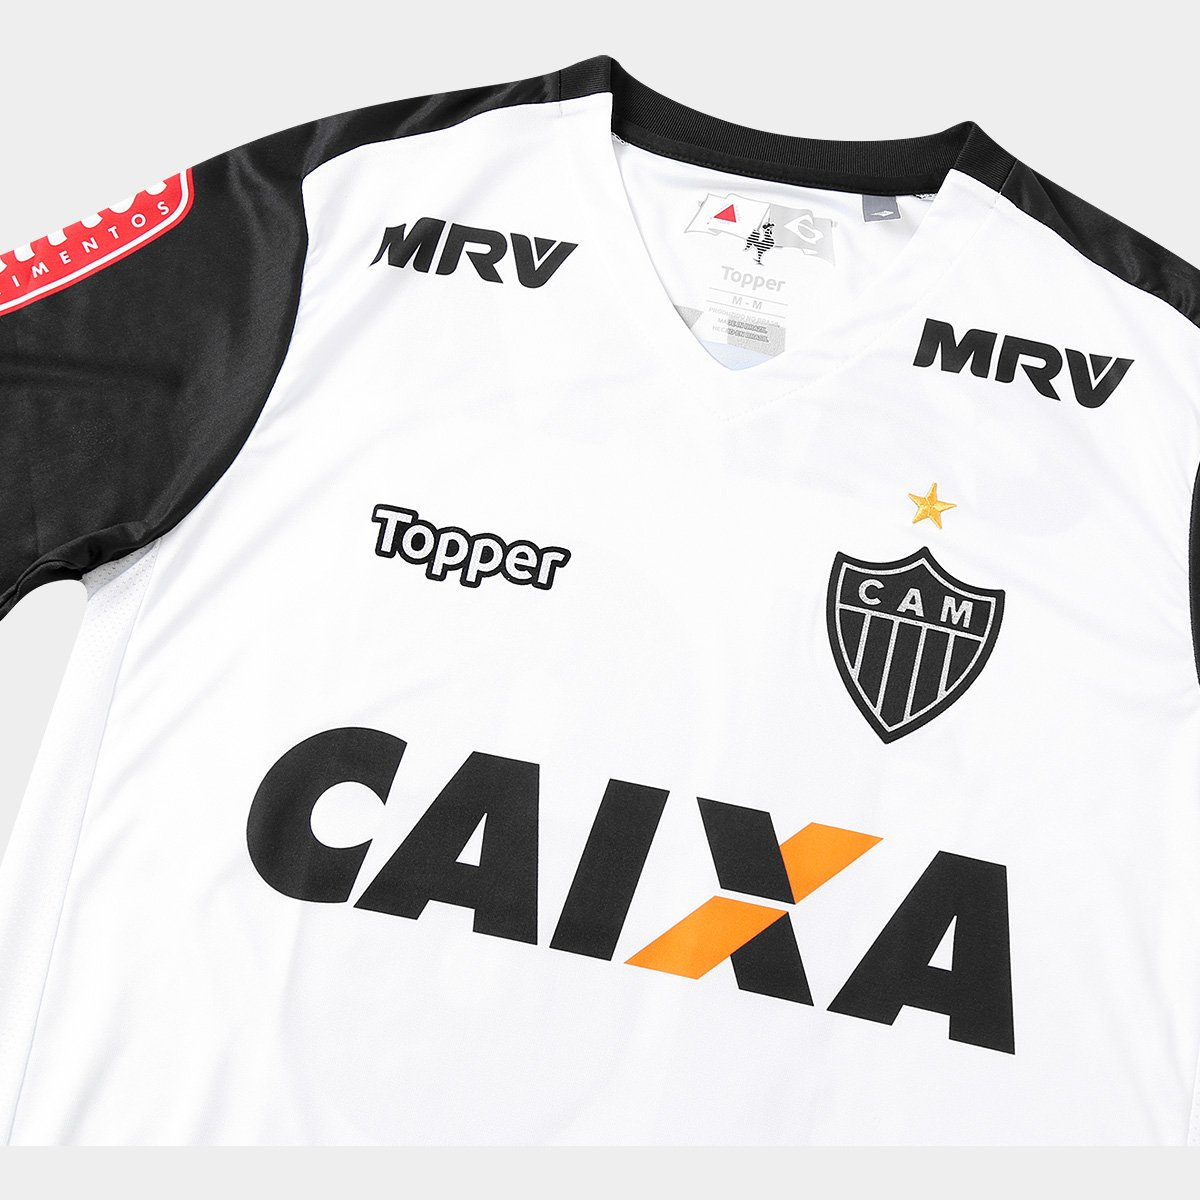 2d1d90de0e Camisa Atlético Mineiro II 17 18 n° 10 Torcedor Topper Masculina ...